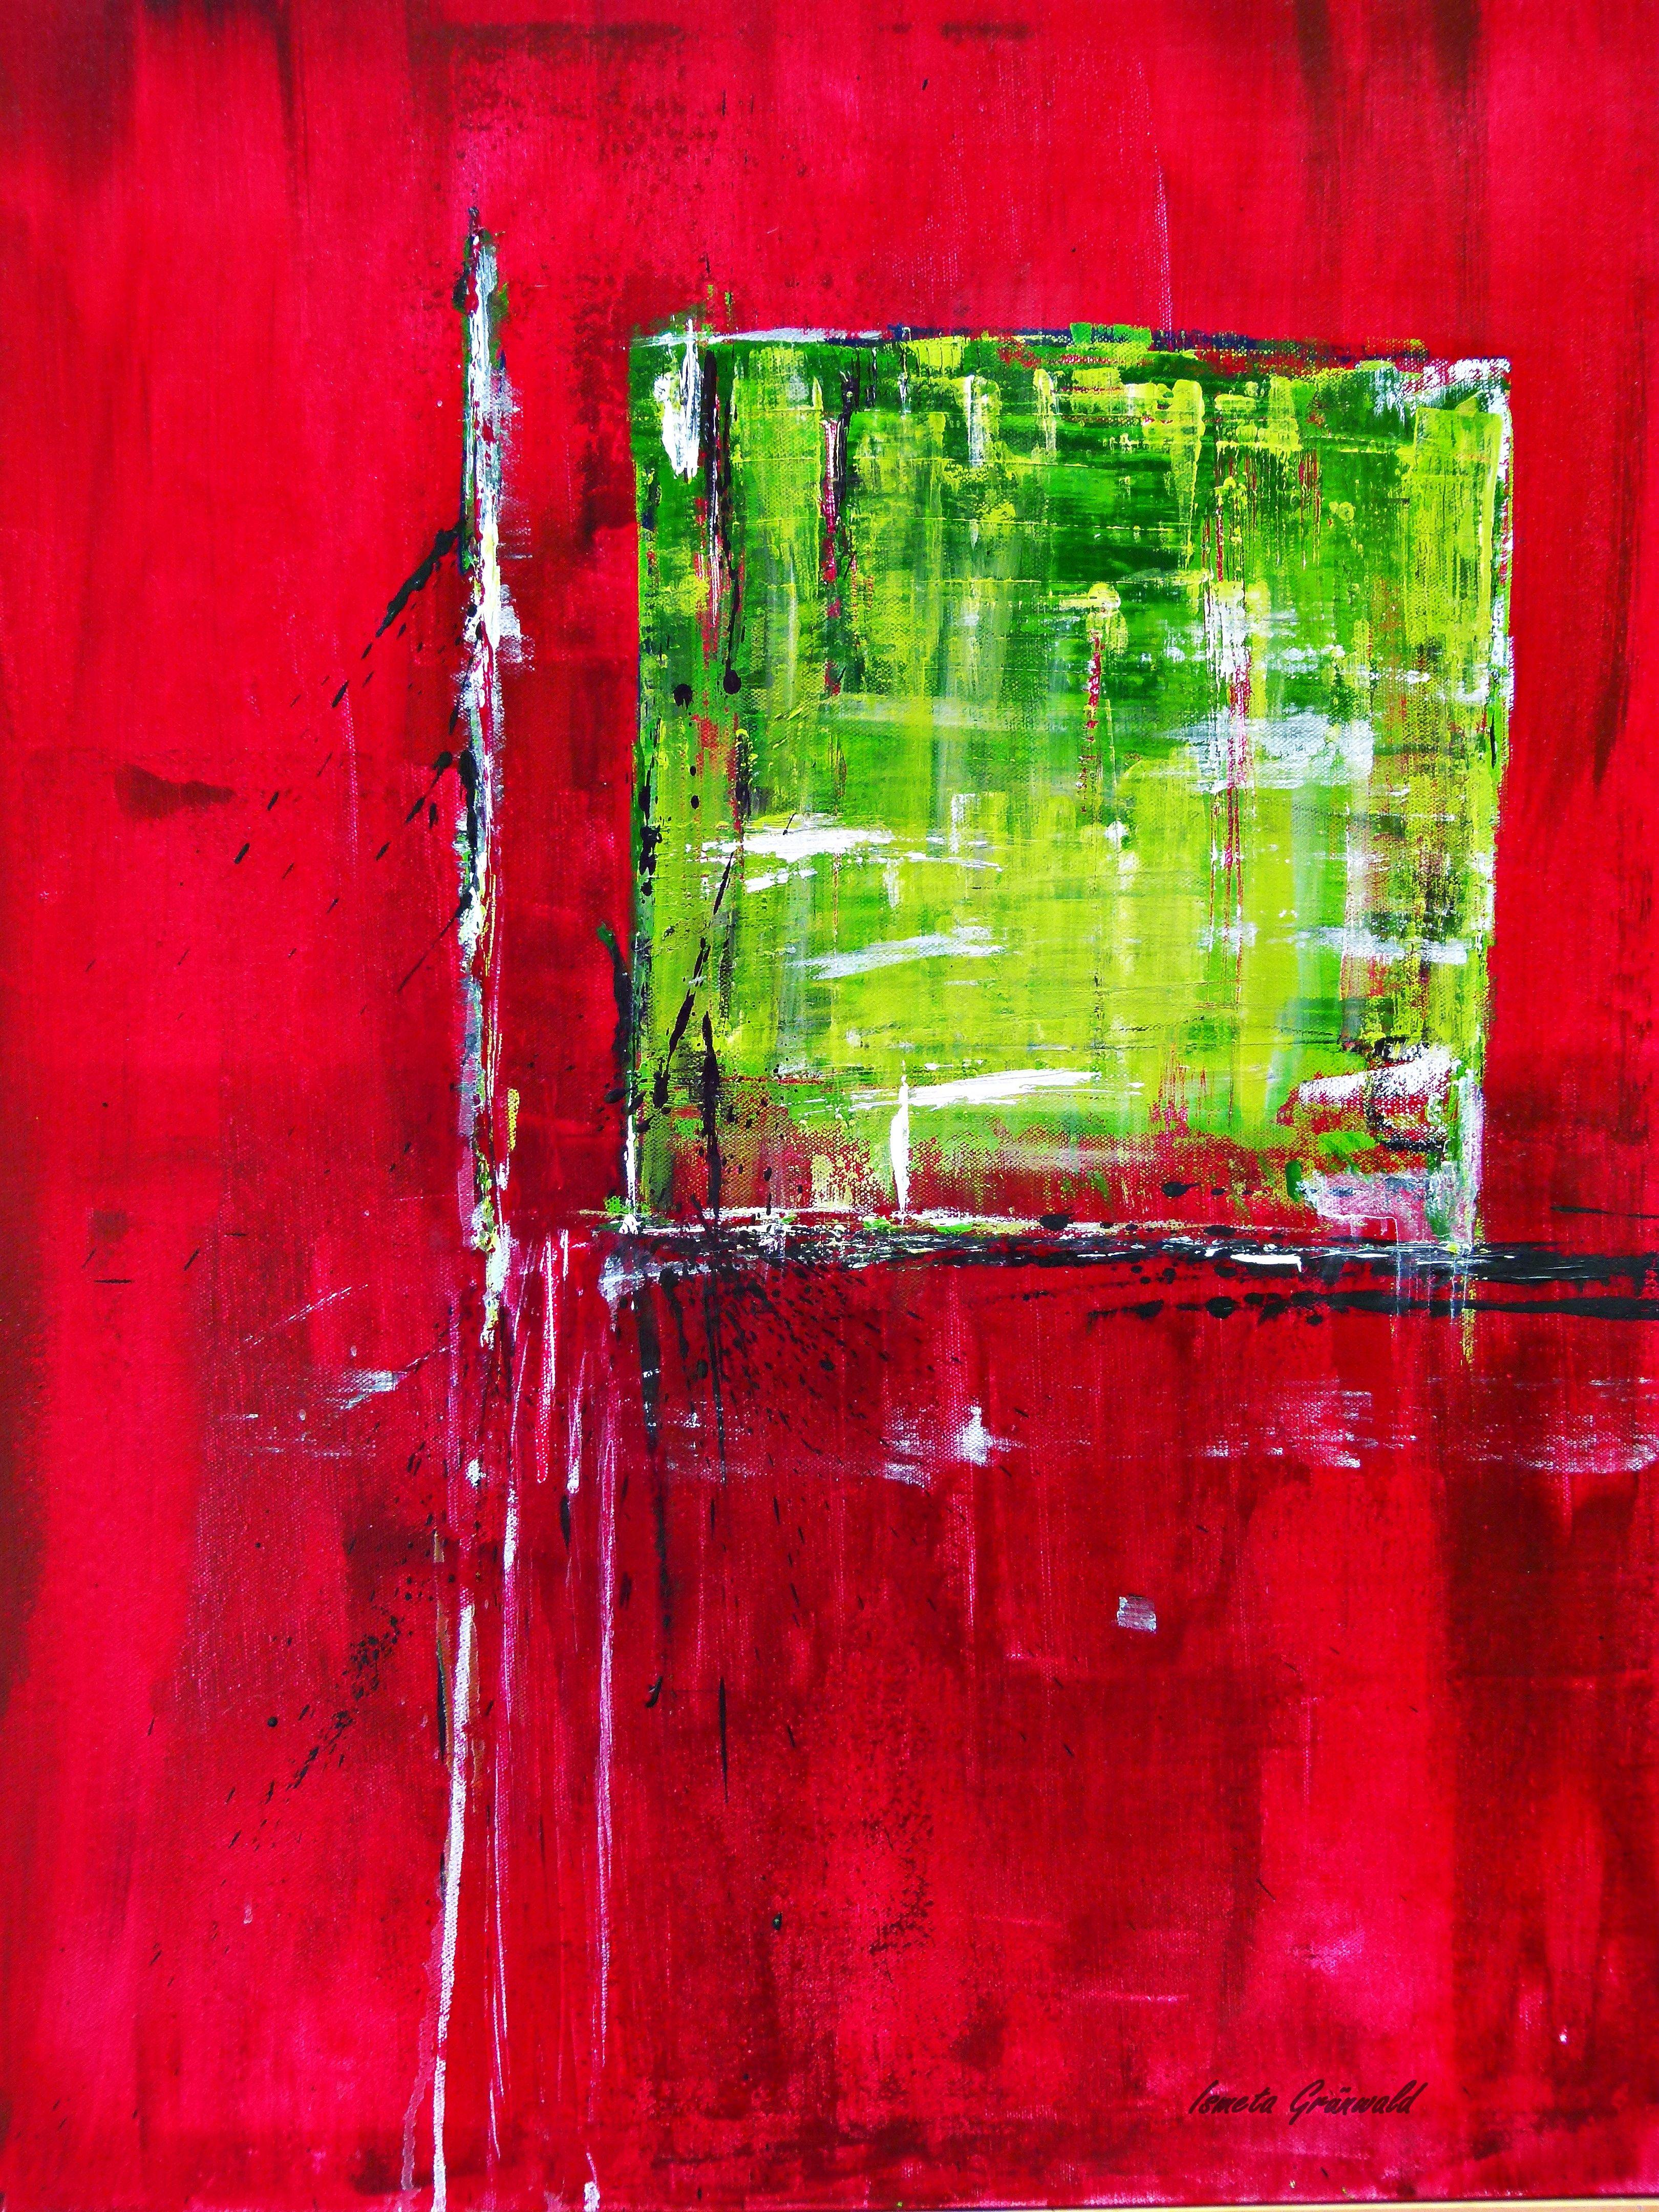 Red Green Abstract Art By Gruenwaldart Deviantart Com Abstract Buy Art Print Abstract Art